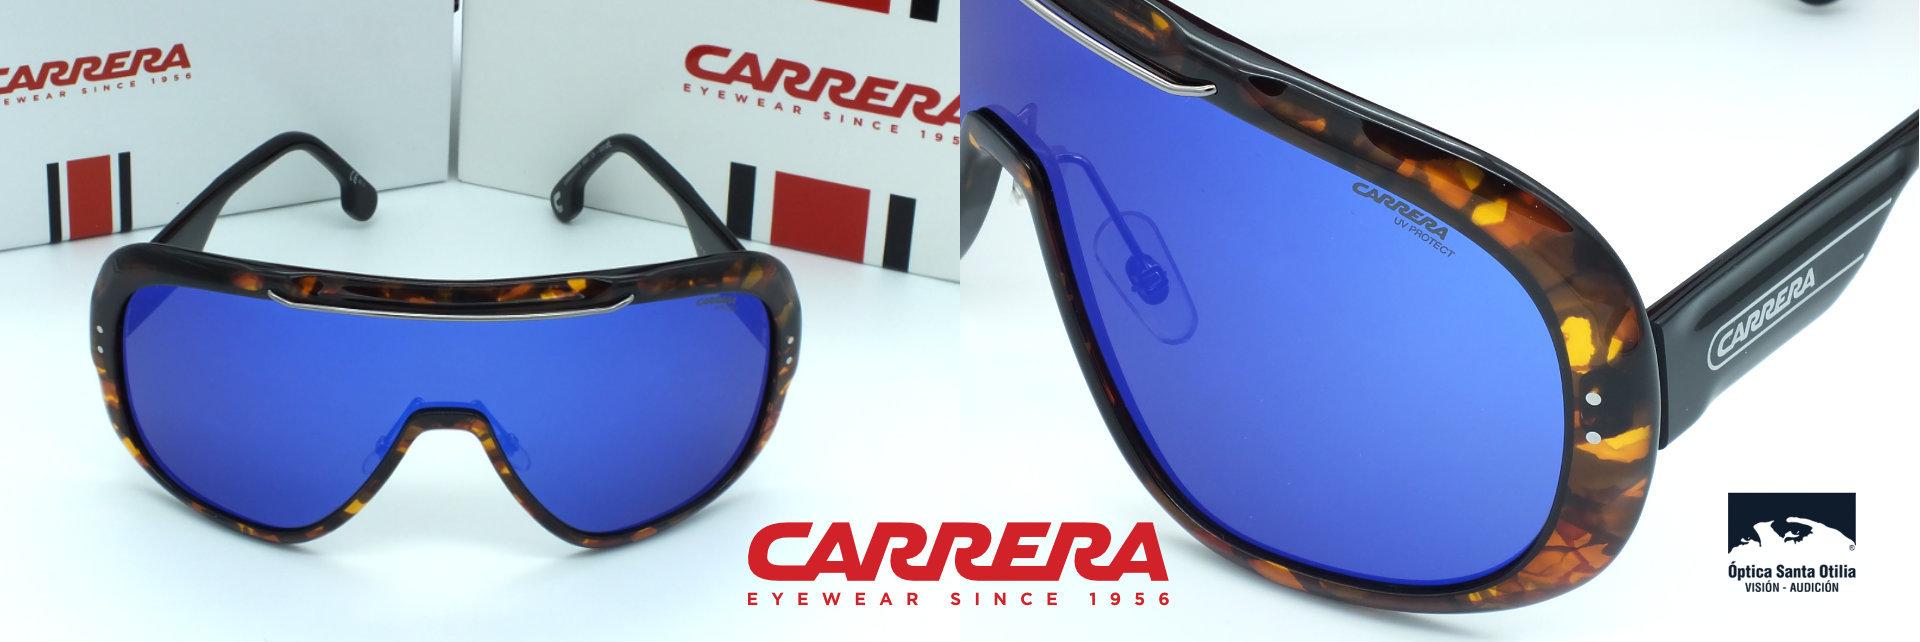 Carrera_2